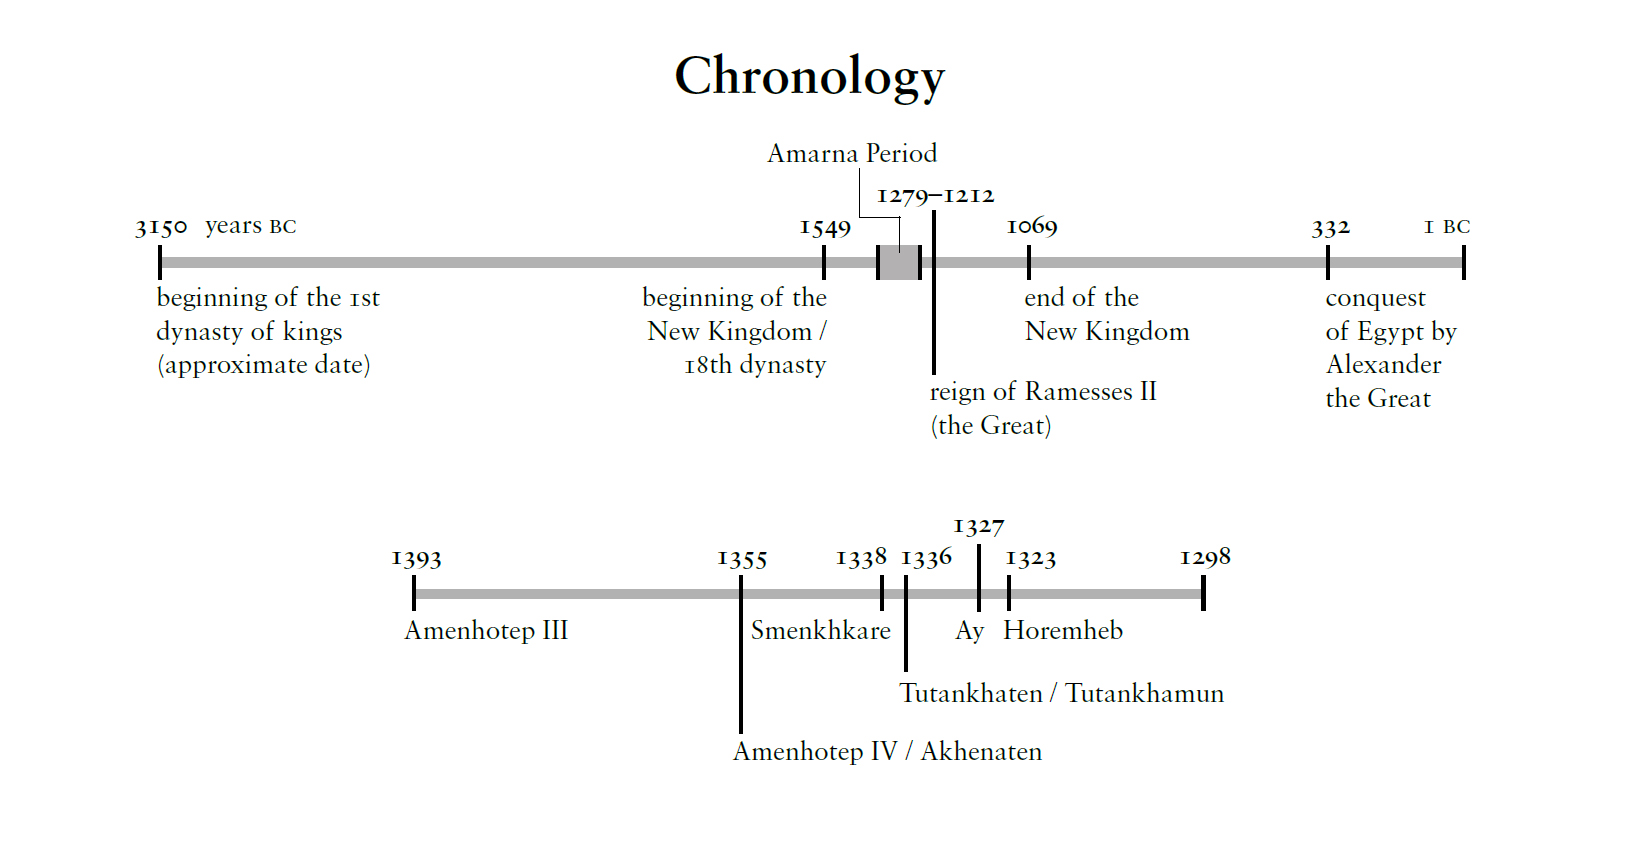 Figure 1, chronology of the Amarna Period (Kemp, 2012, p. 304)